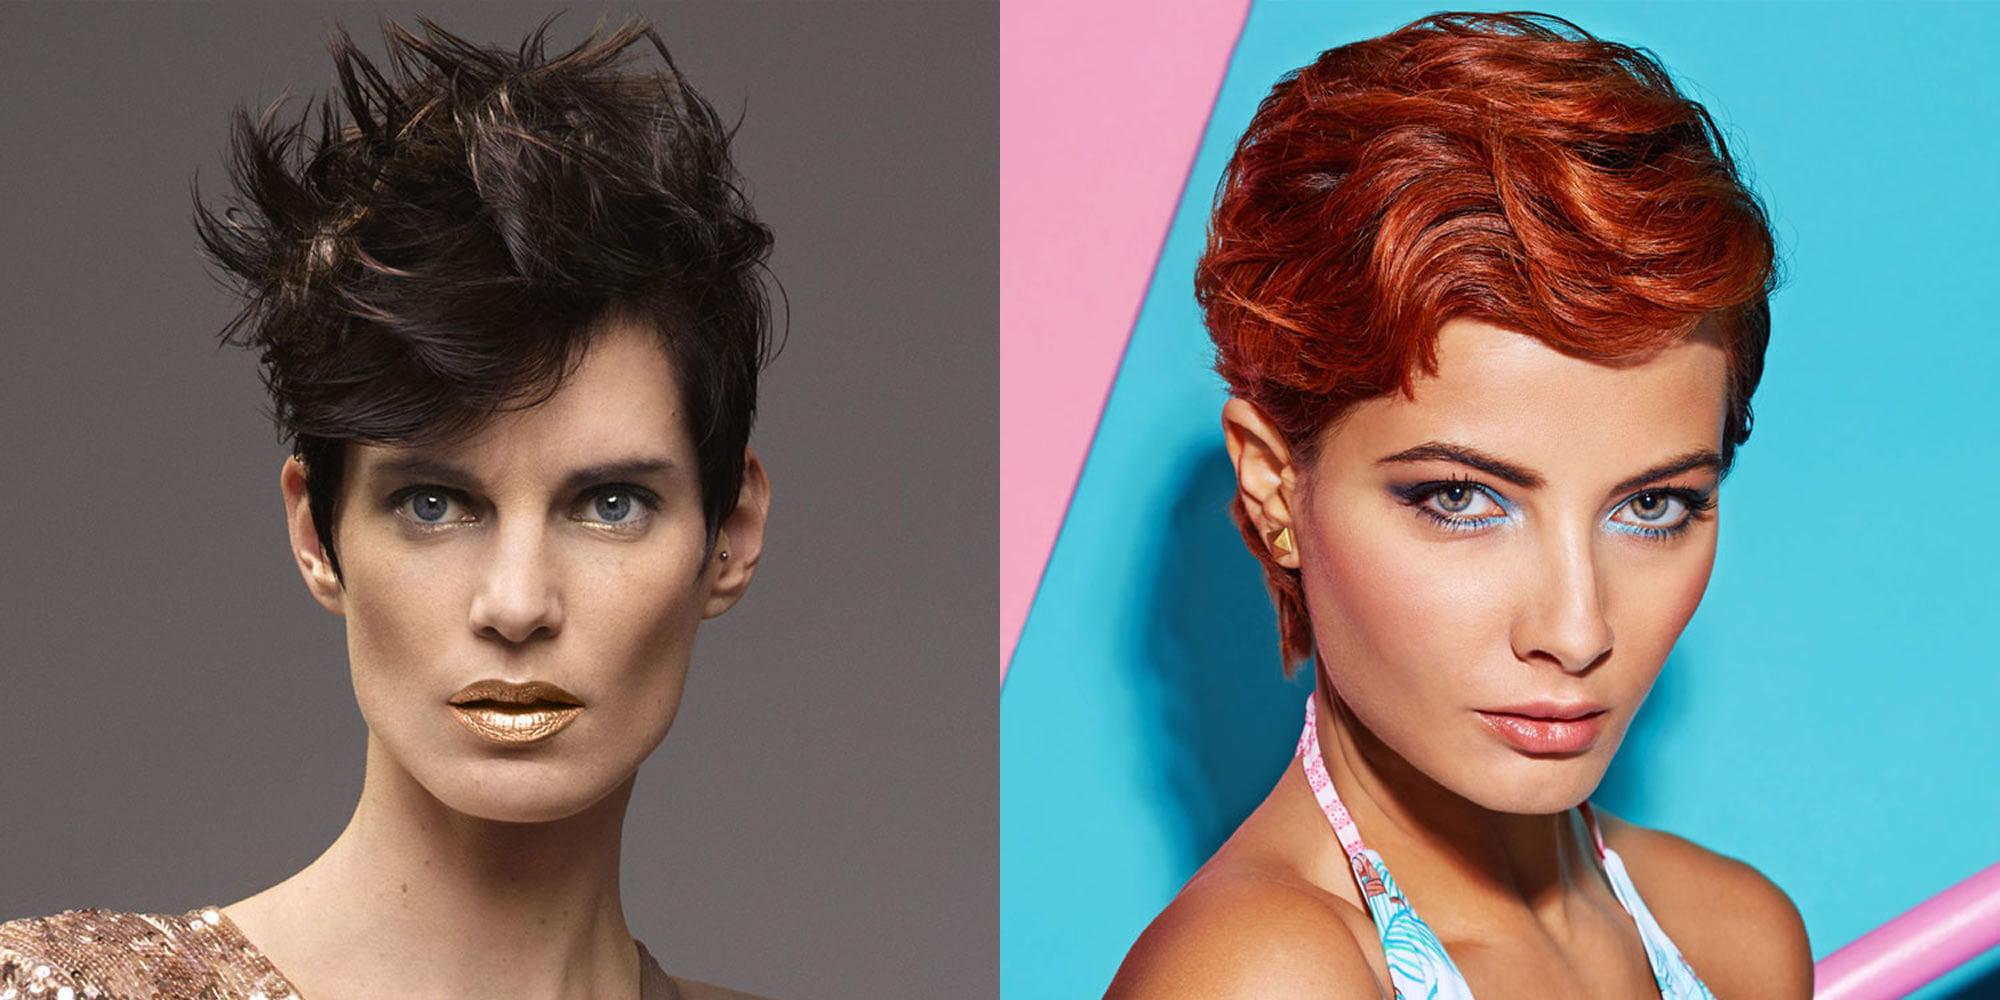 New Haircut Ideas for Short Hair 2018-2019 & Hair Color ...